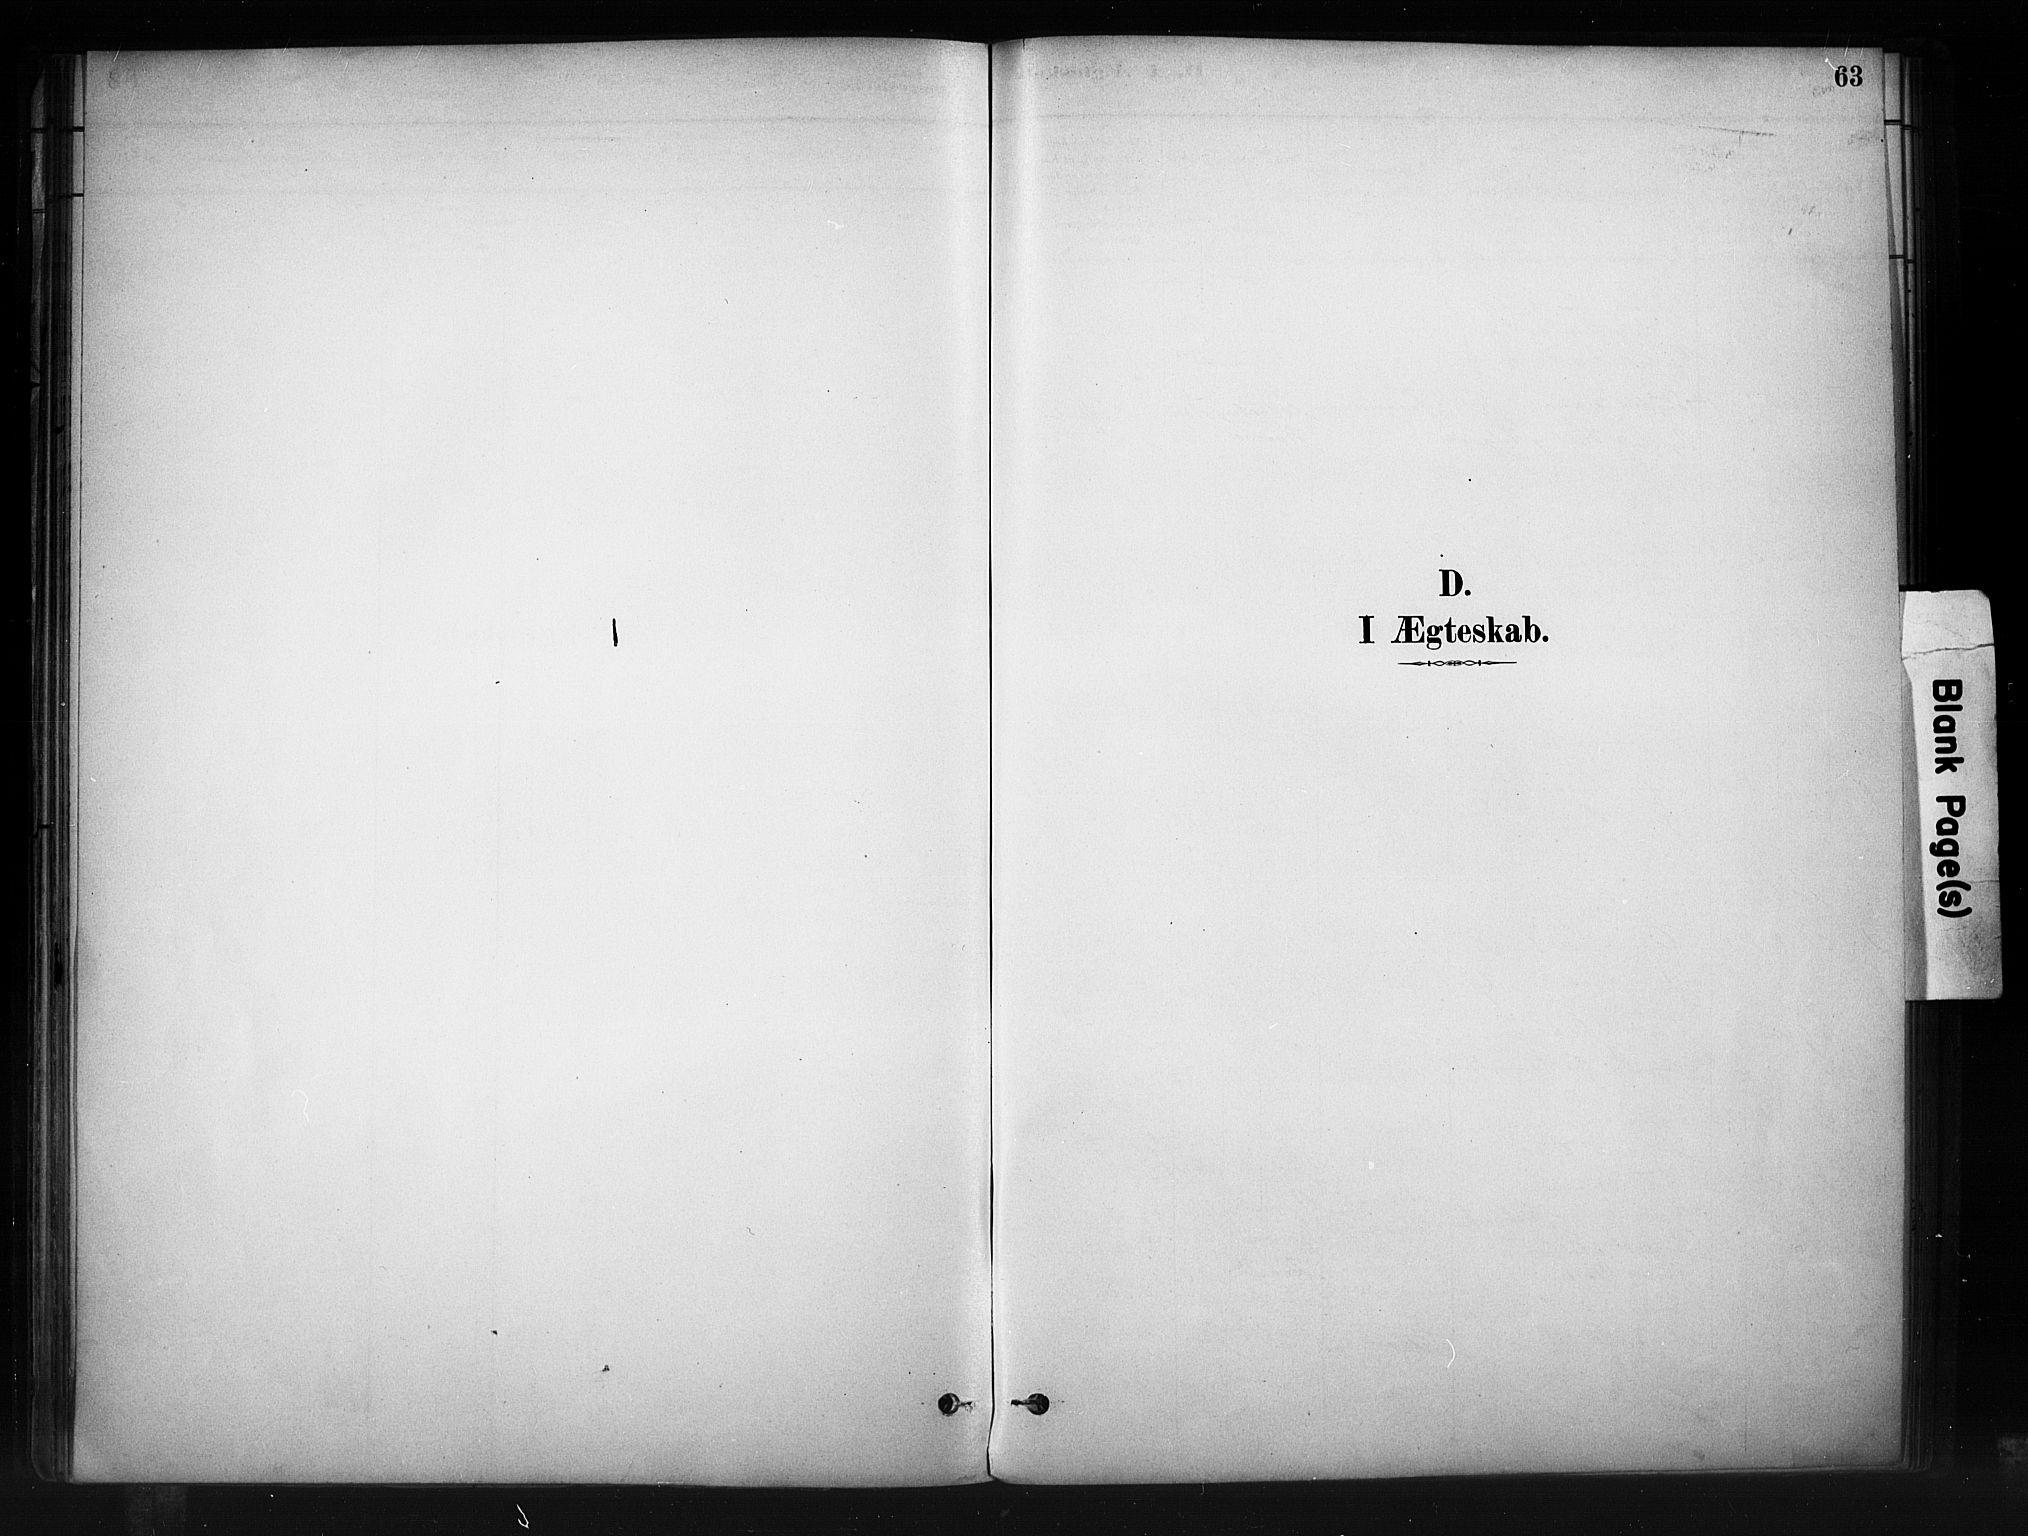 SAH, Nord-Aurdal prestekontor, Ministerialbok nr. 10, 1883-1896, s. 63